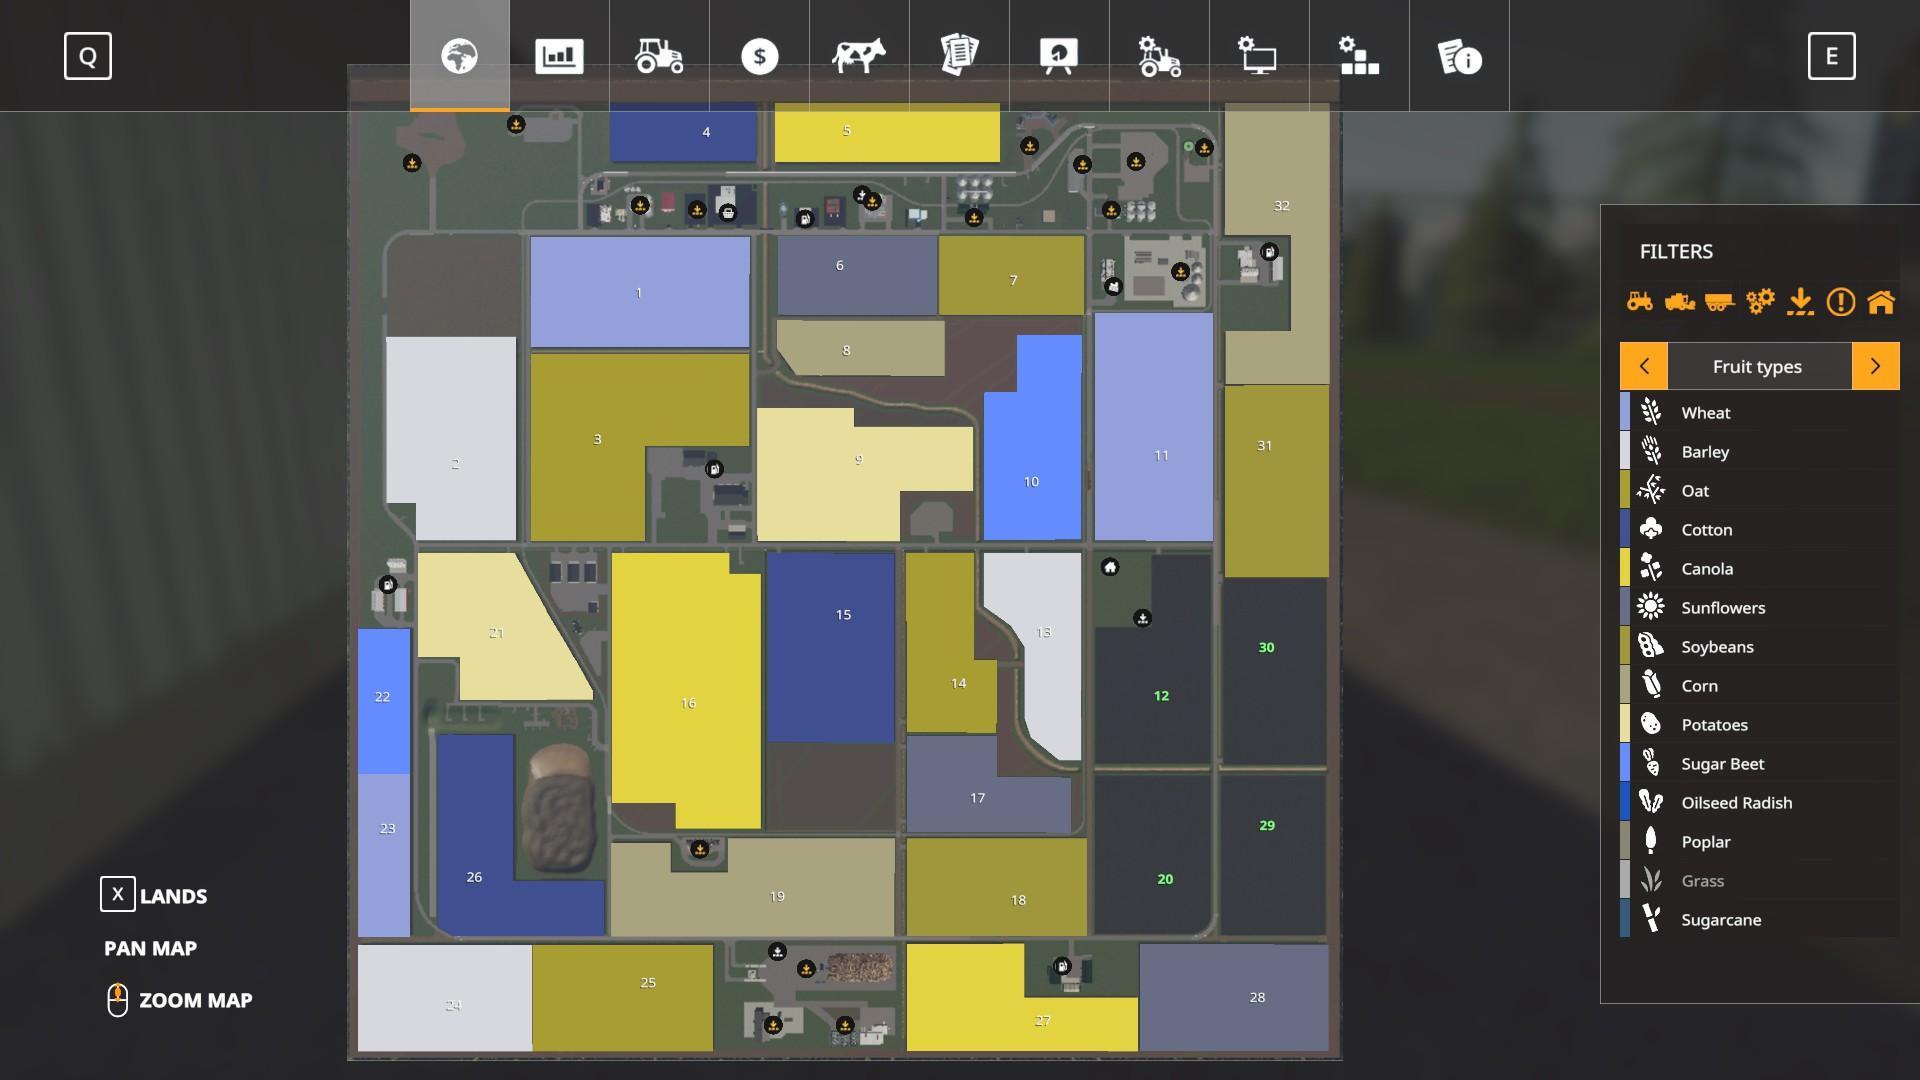 Michigan Map 19 v2.0 FS19 - Farming Simulator 19 Mod | FS19 mod